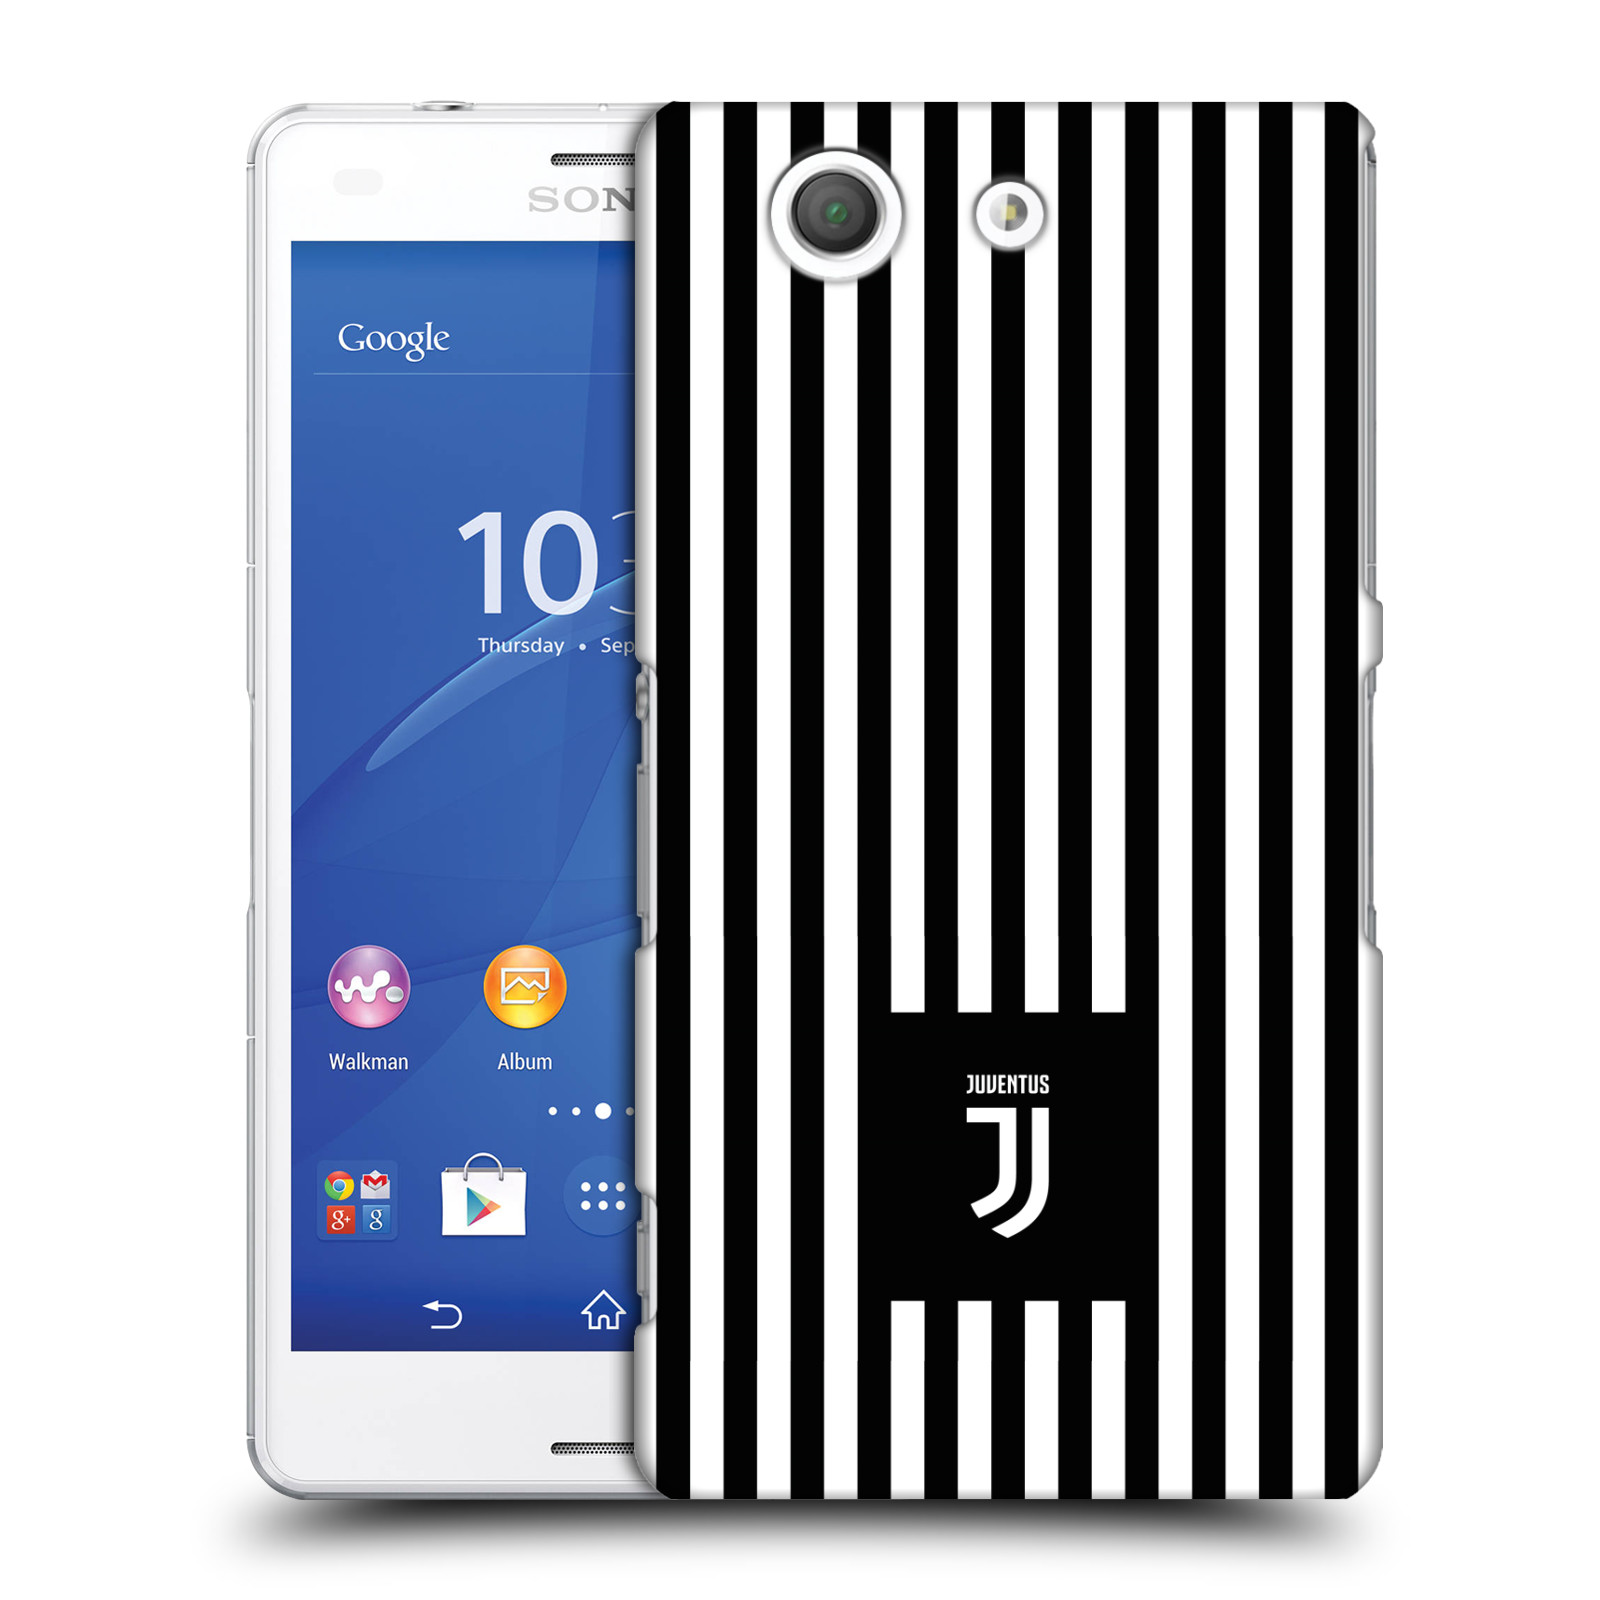 Plastové pouzdro na mobil Sony Xperia Z3 Compact D5803 - Head Case - Juventus FC - Nové logo - Pruhy